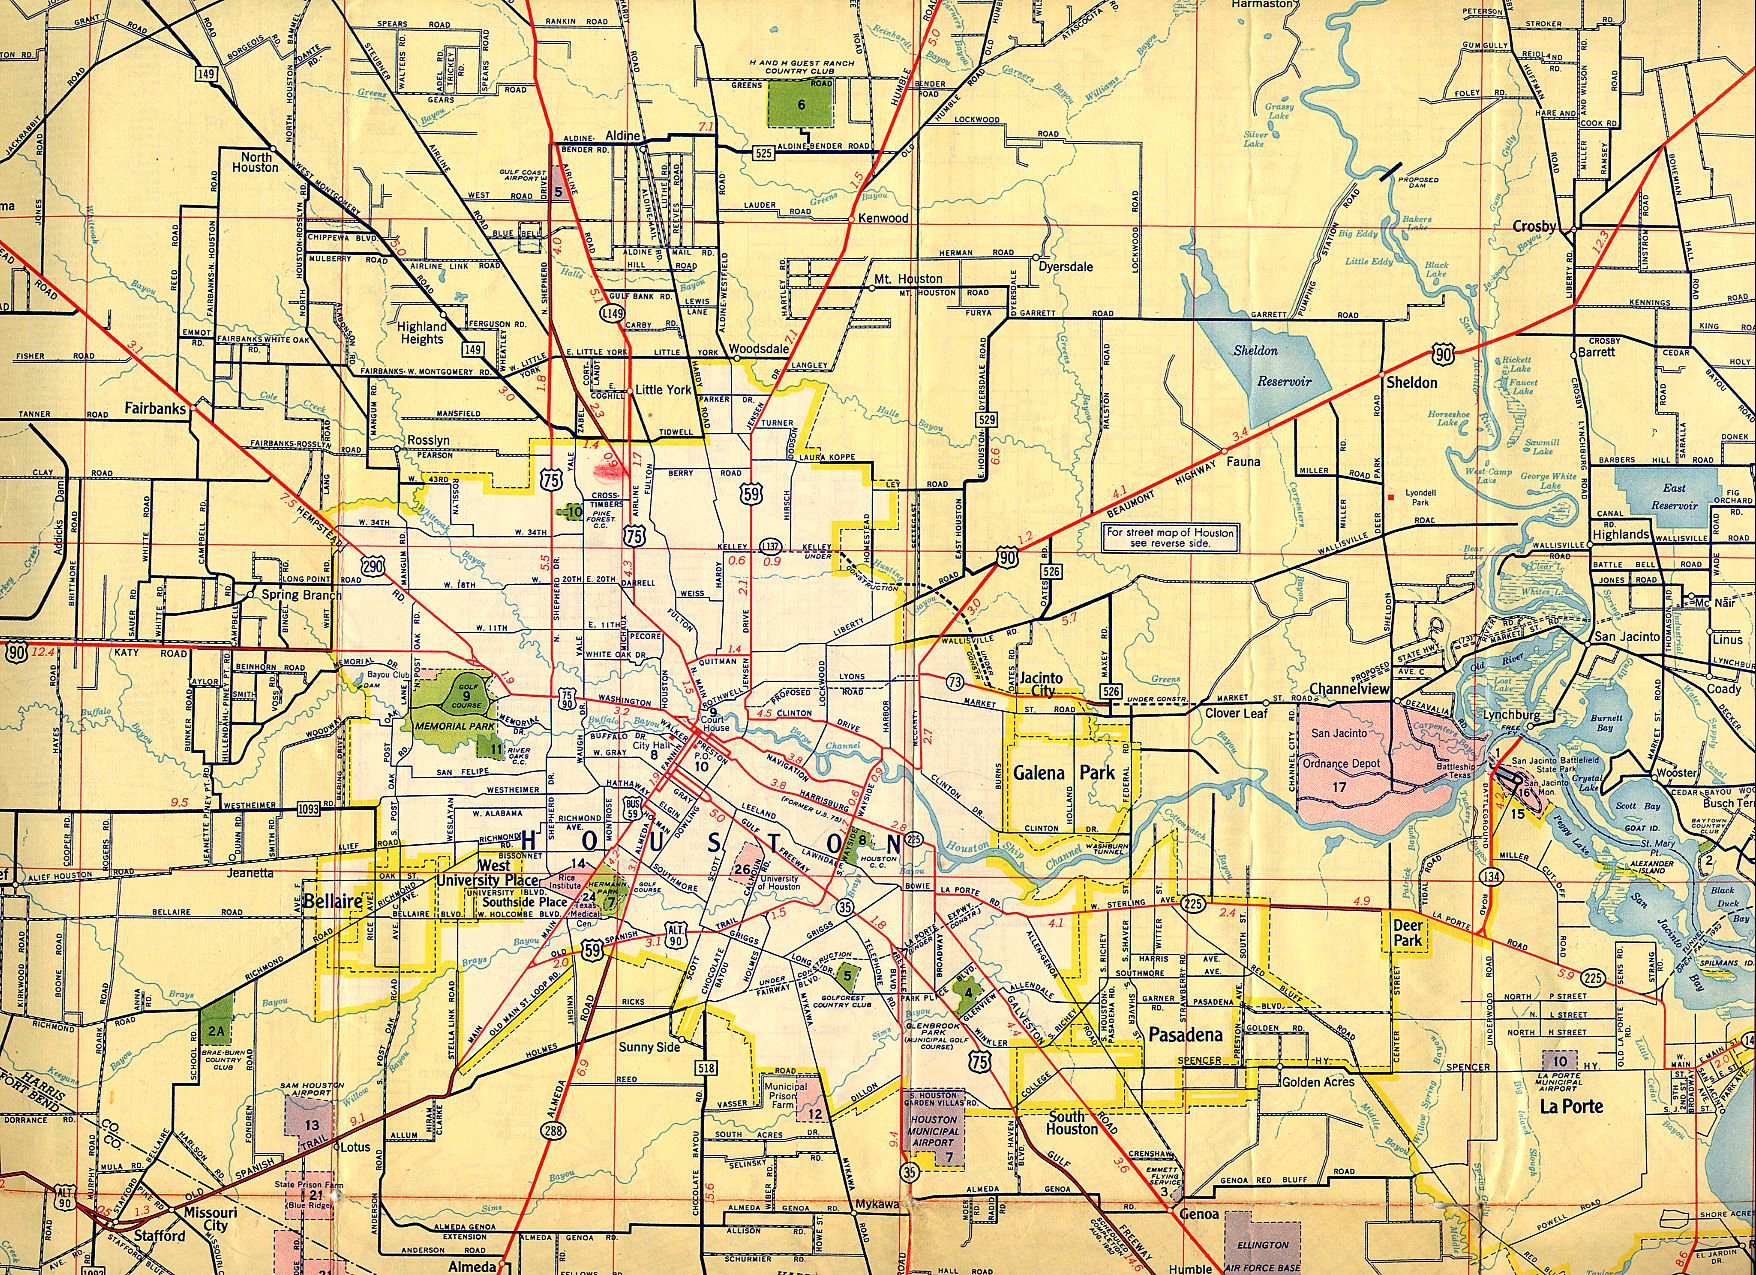 Карта Хьюстона США Подробная карта Хьюстона на русском